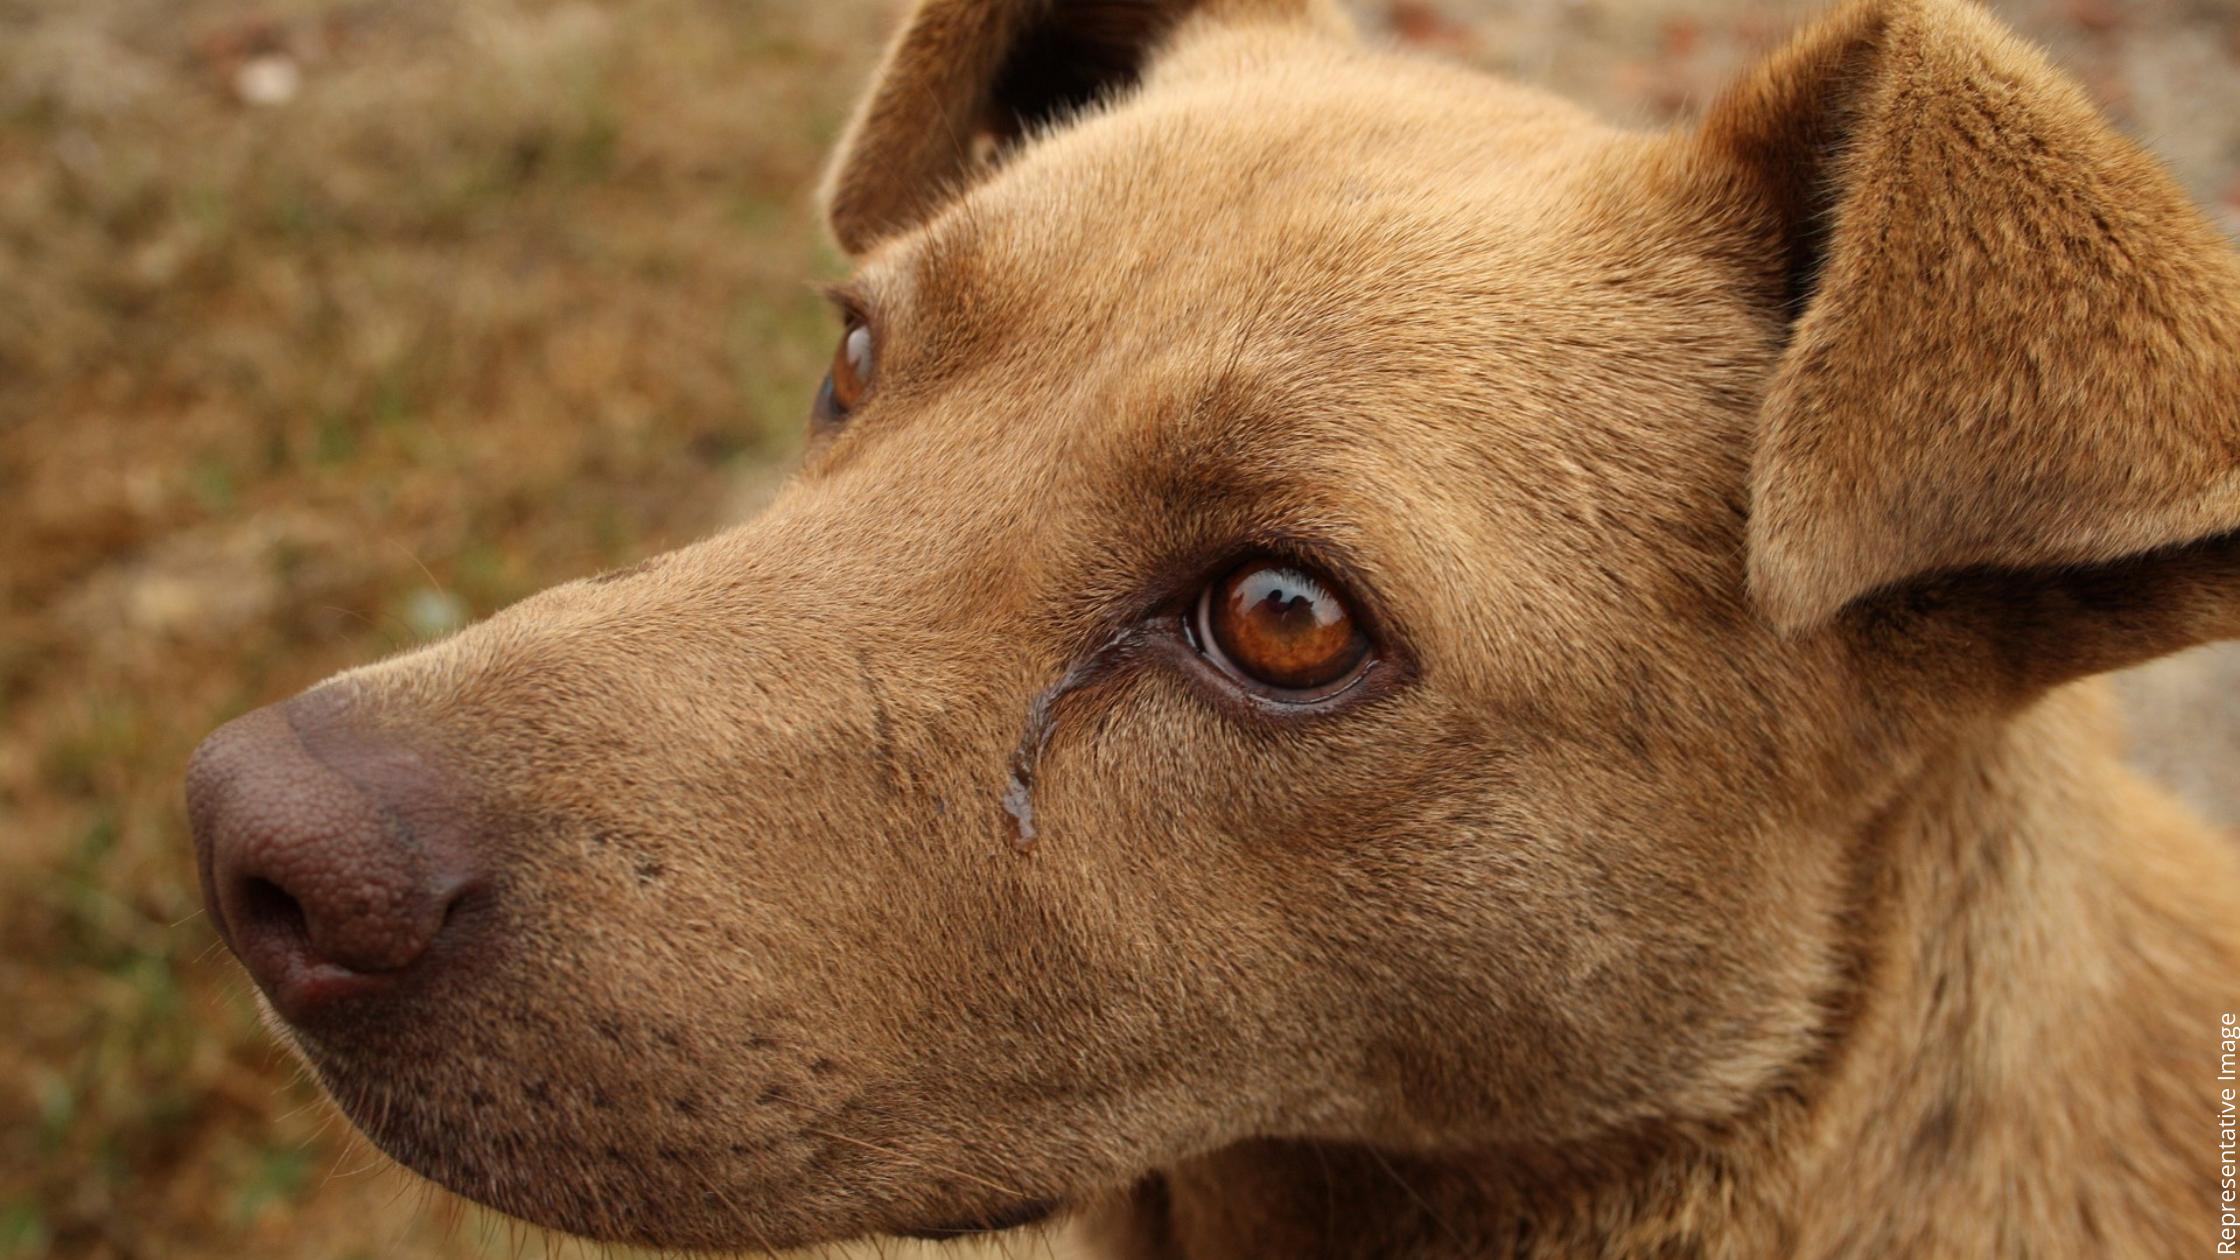 thane dog acid attack